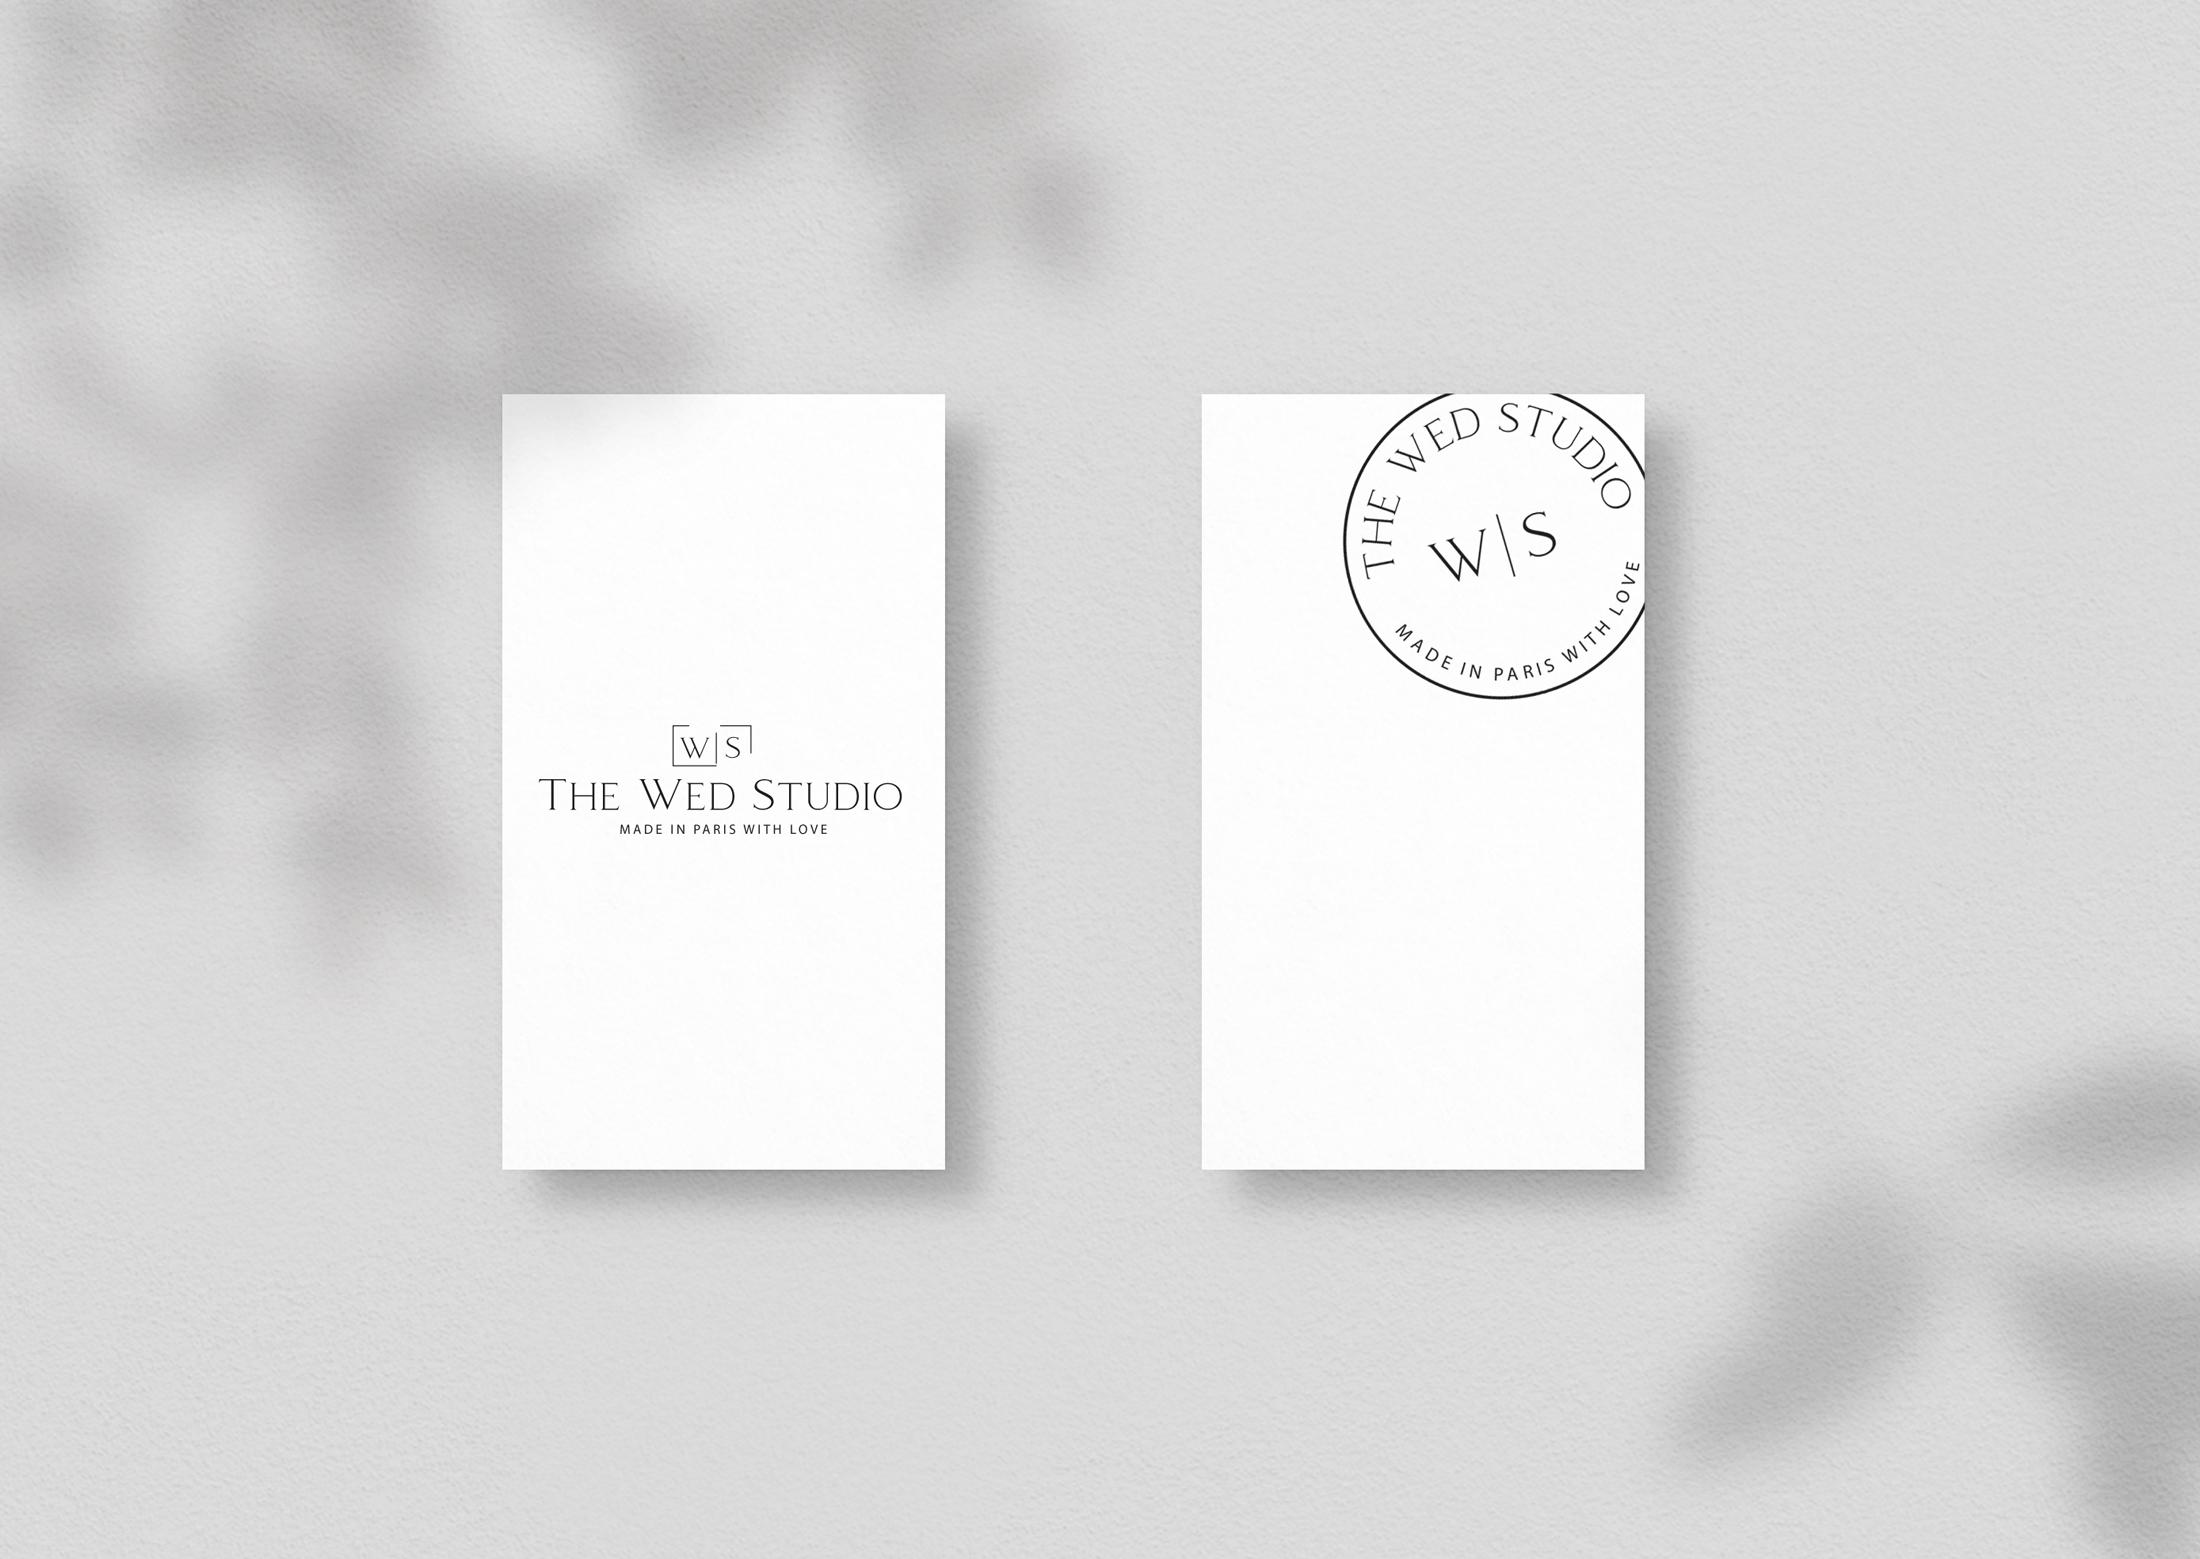 branding the wed studio Chic Studio